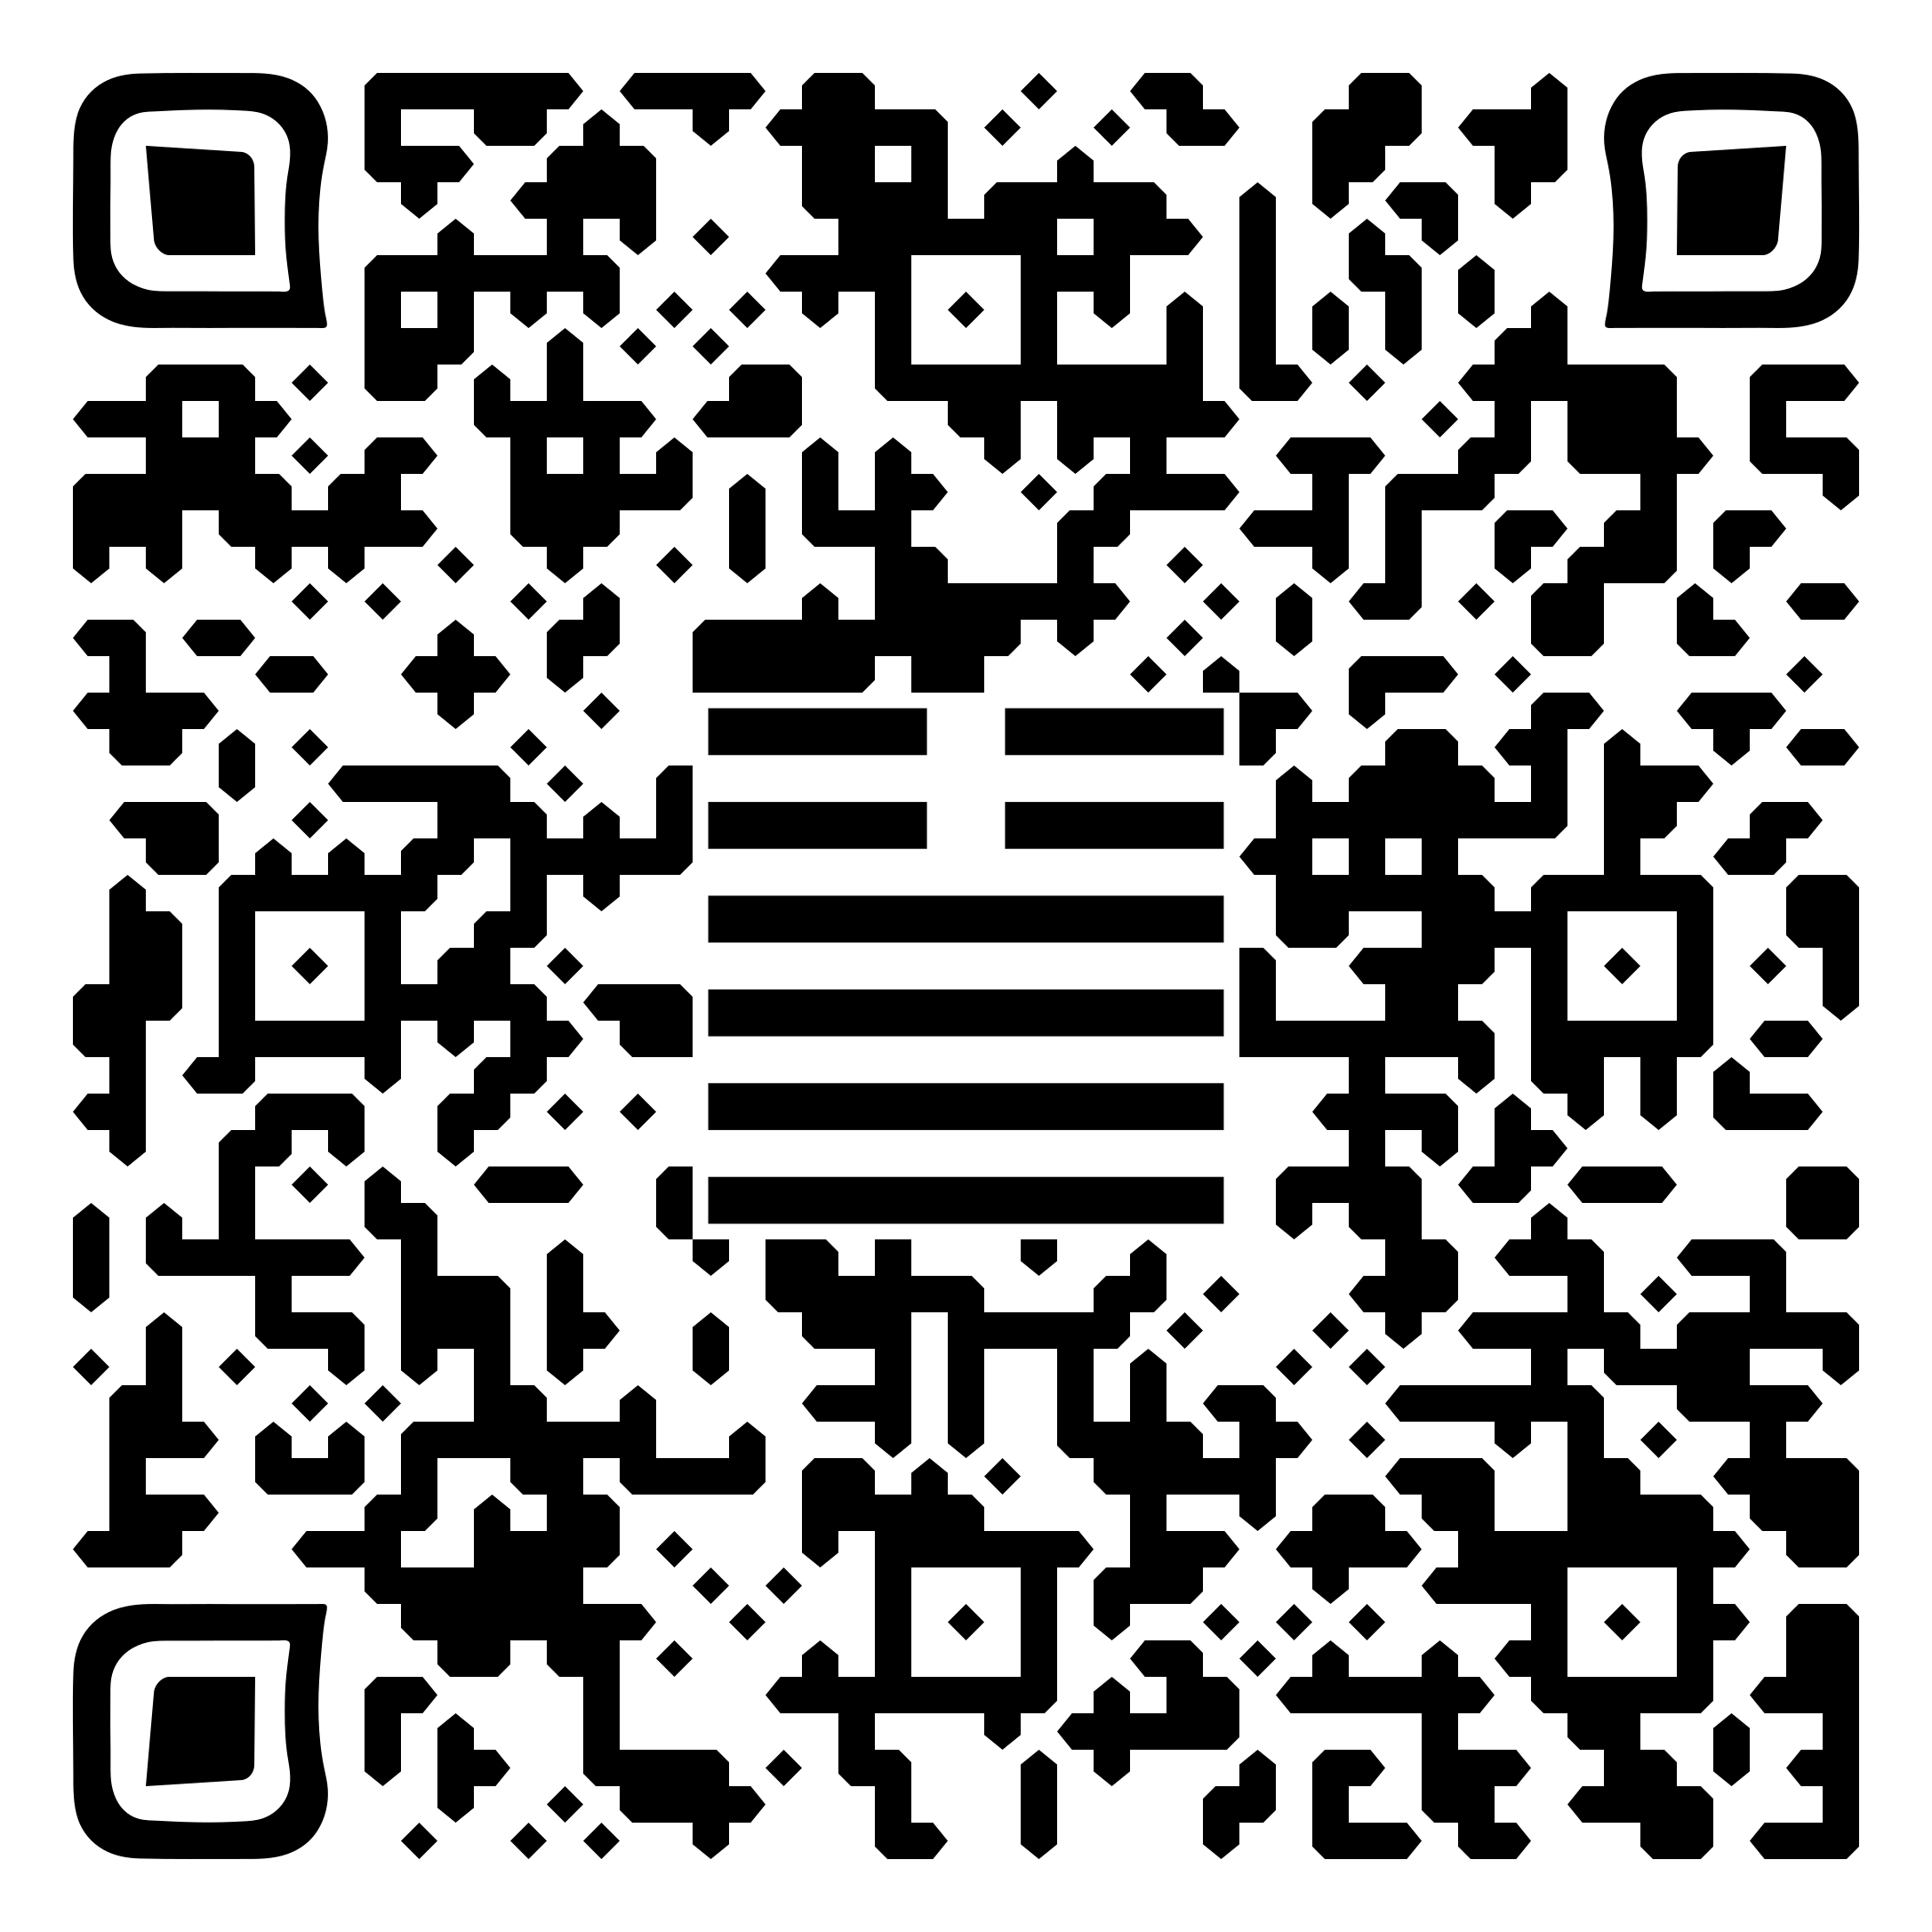 qr-code-34.png